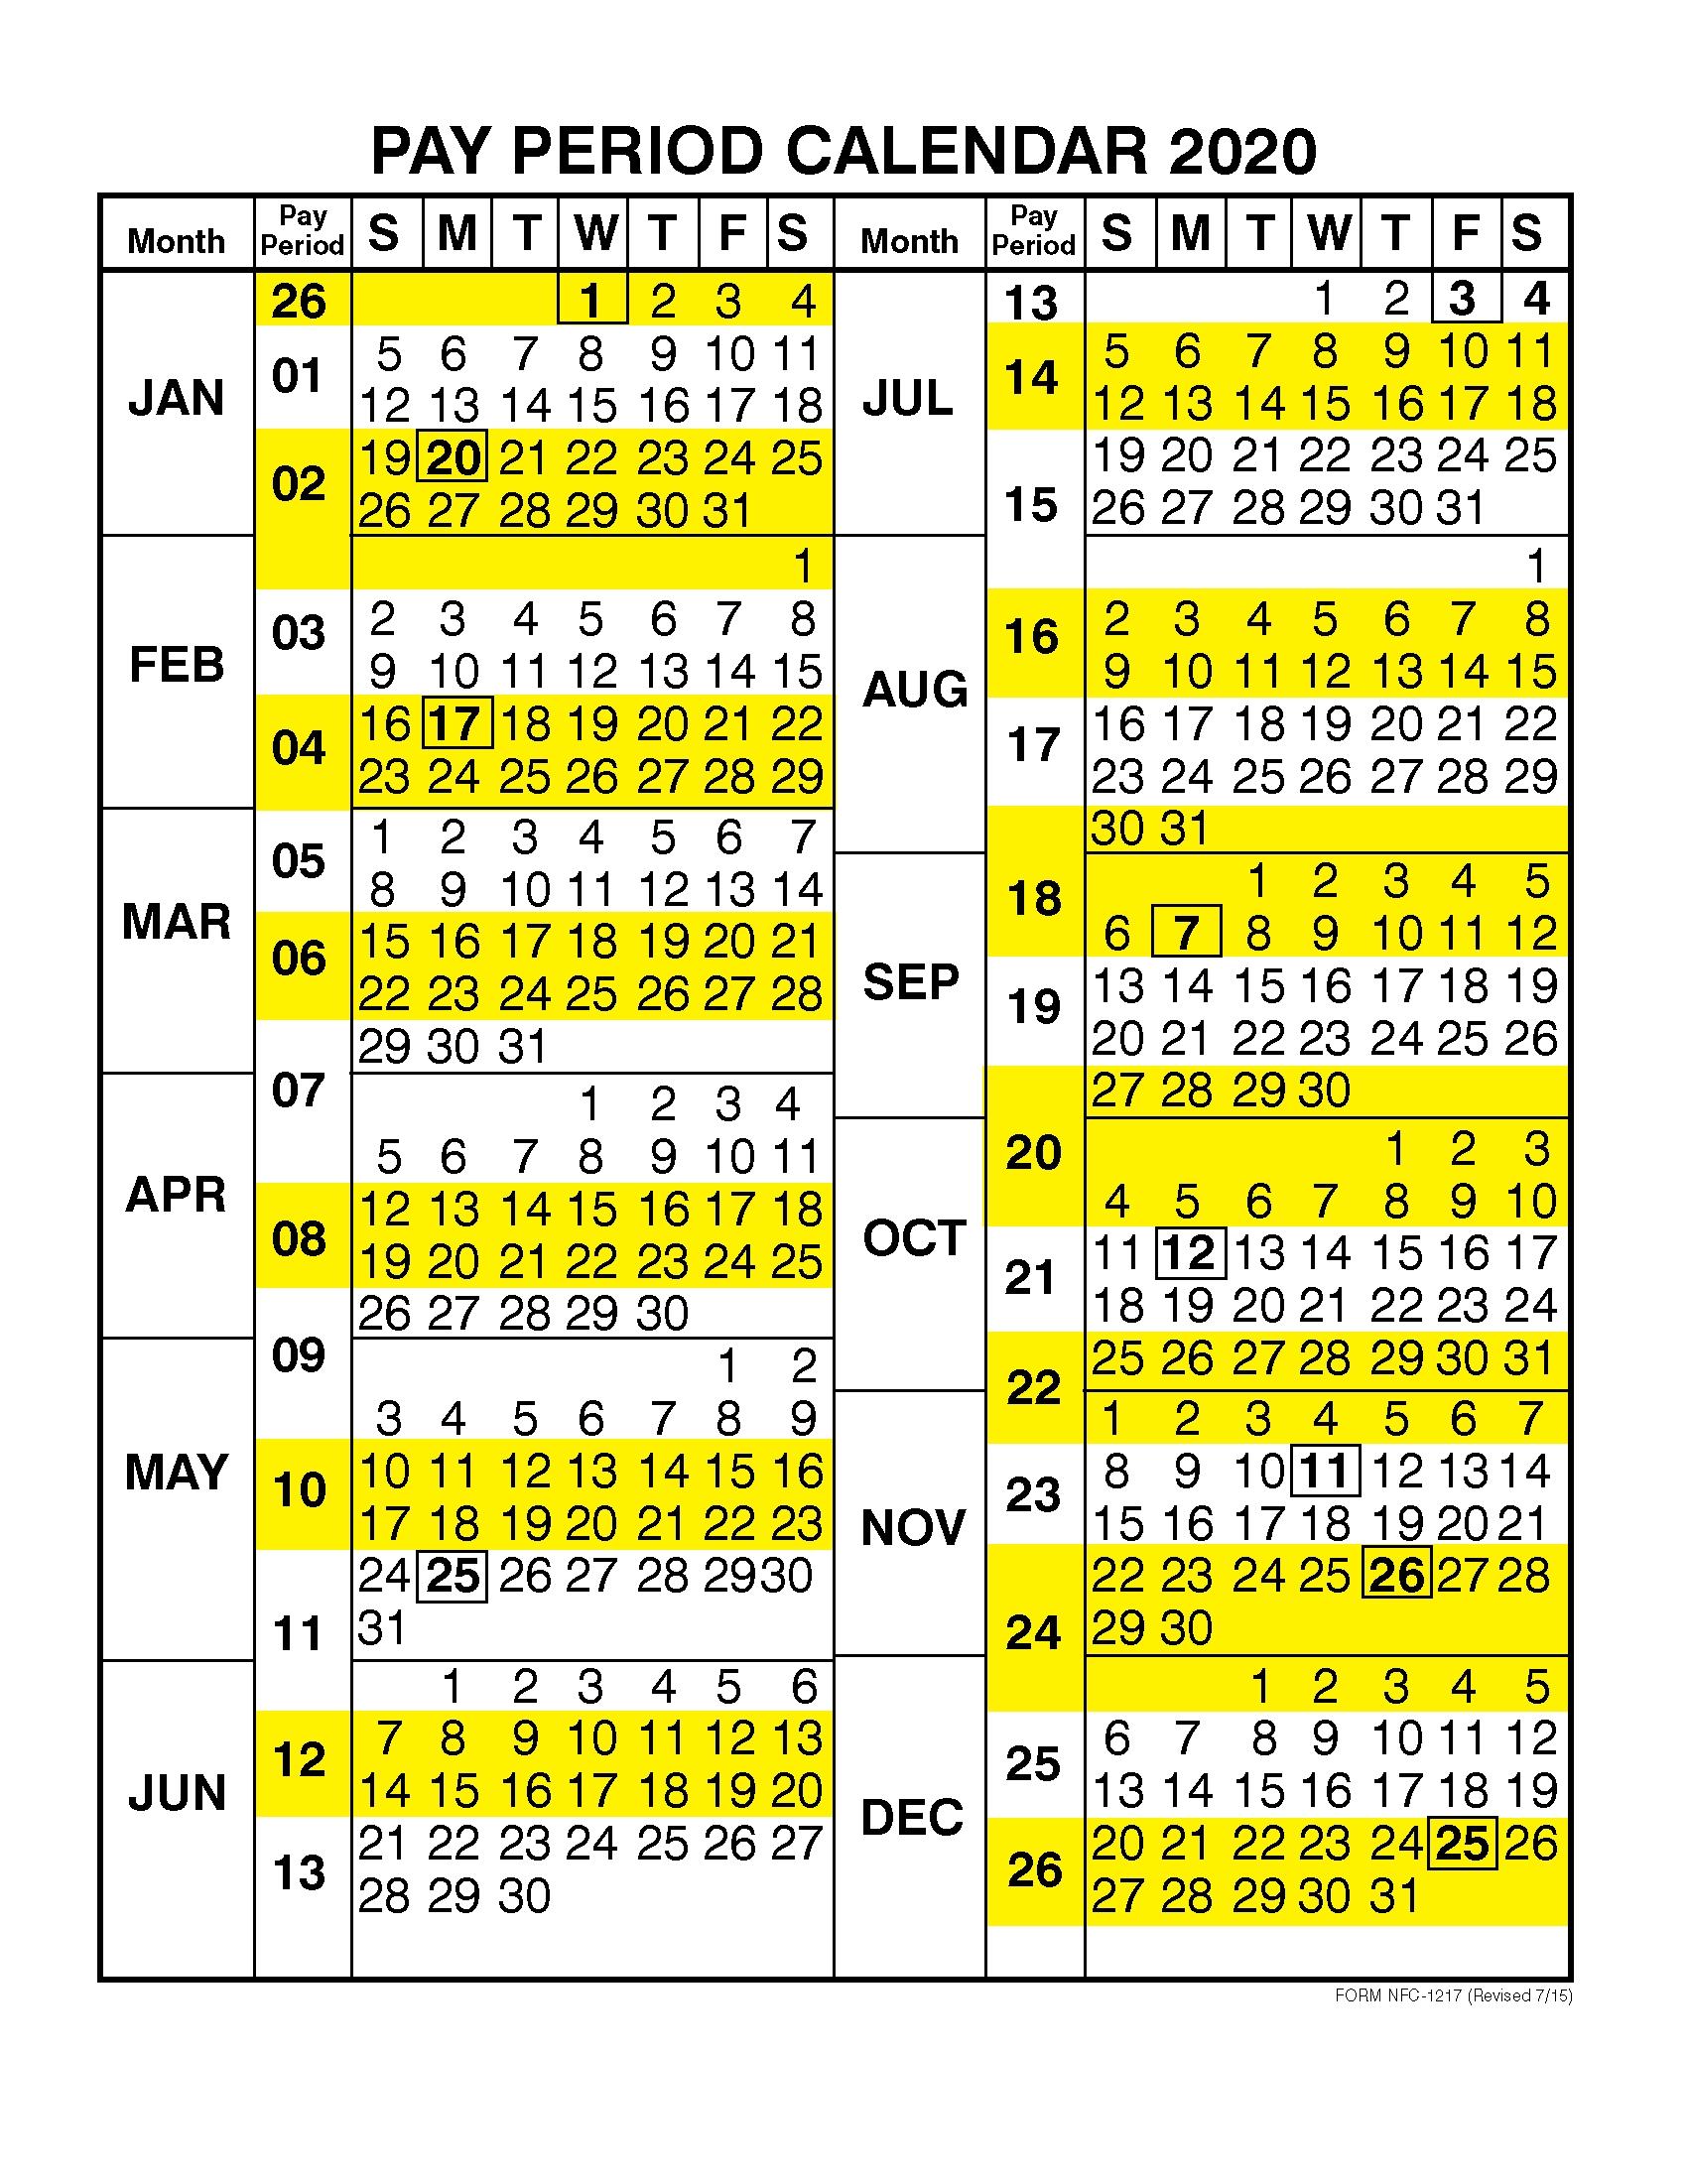 Ctu Payroll Calendar 2020 | 2021 Pay Periods Calendar pertaining to Federal Civilian Pay Calendar 2020